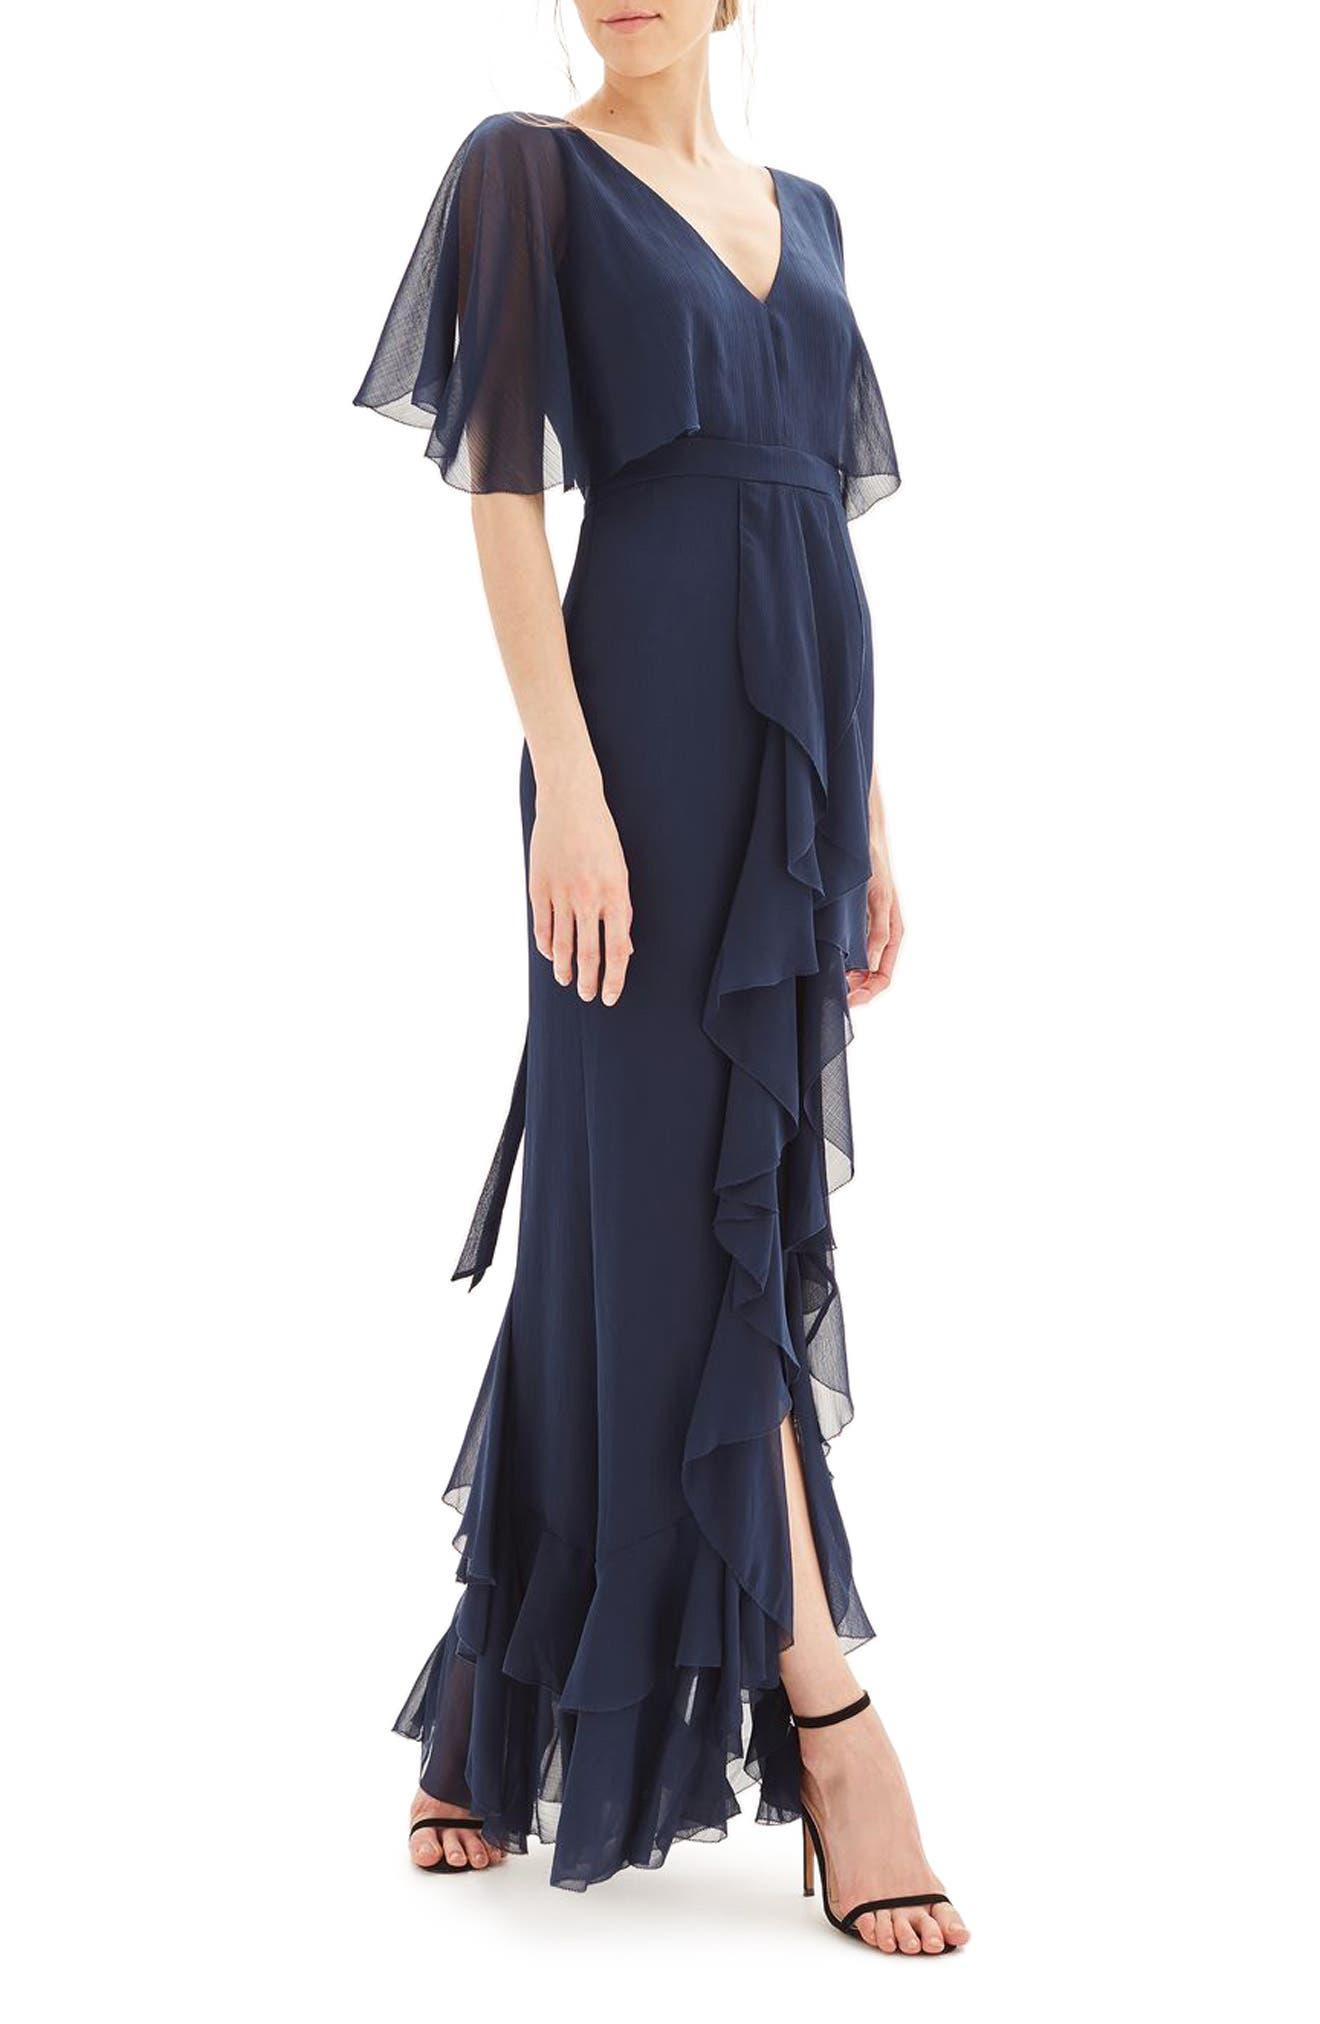 Topshop Bride Cascade Gown